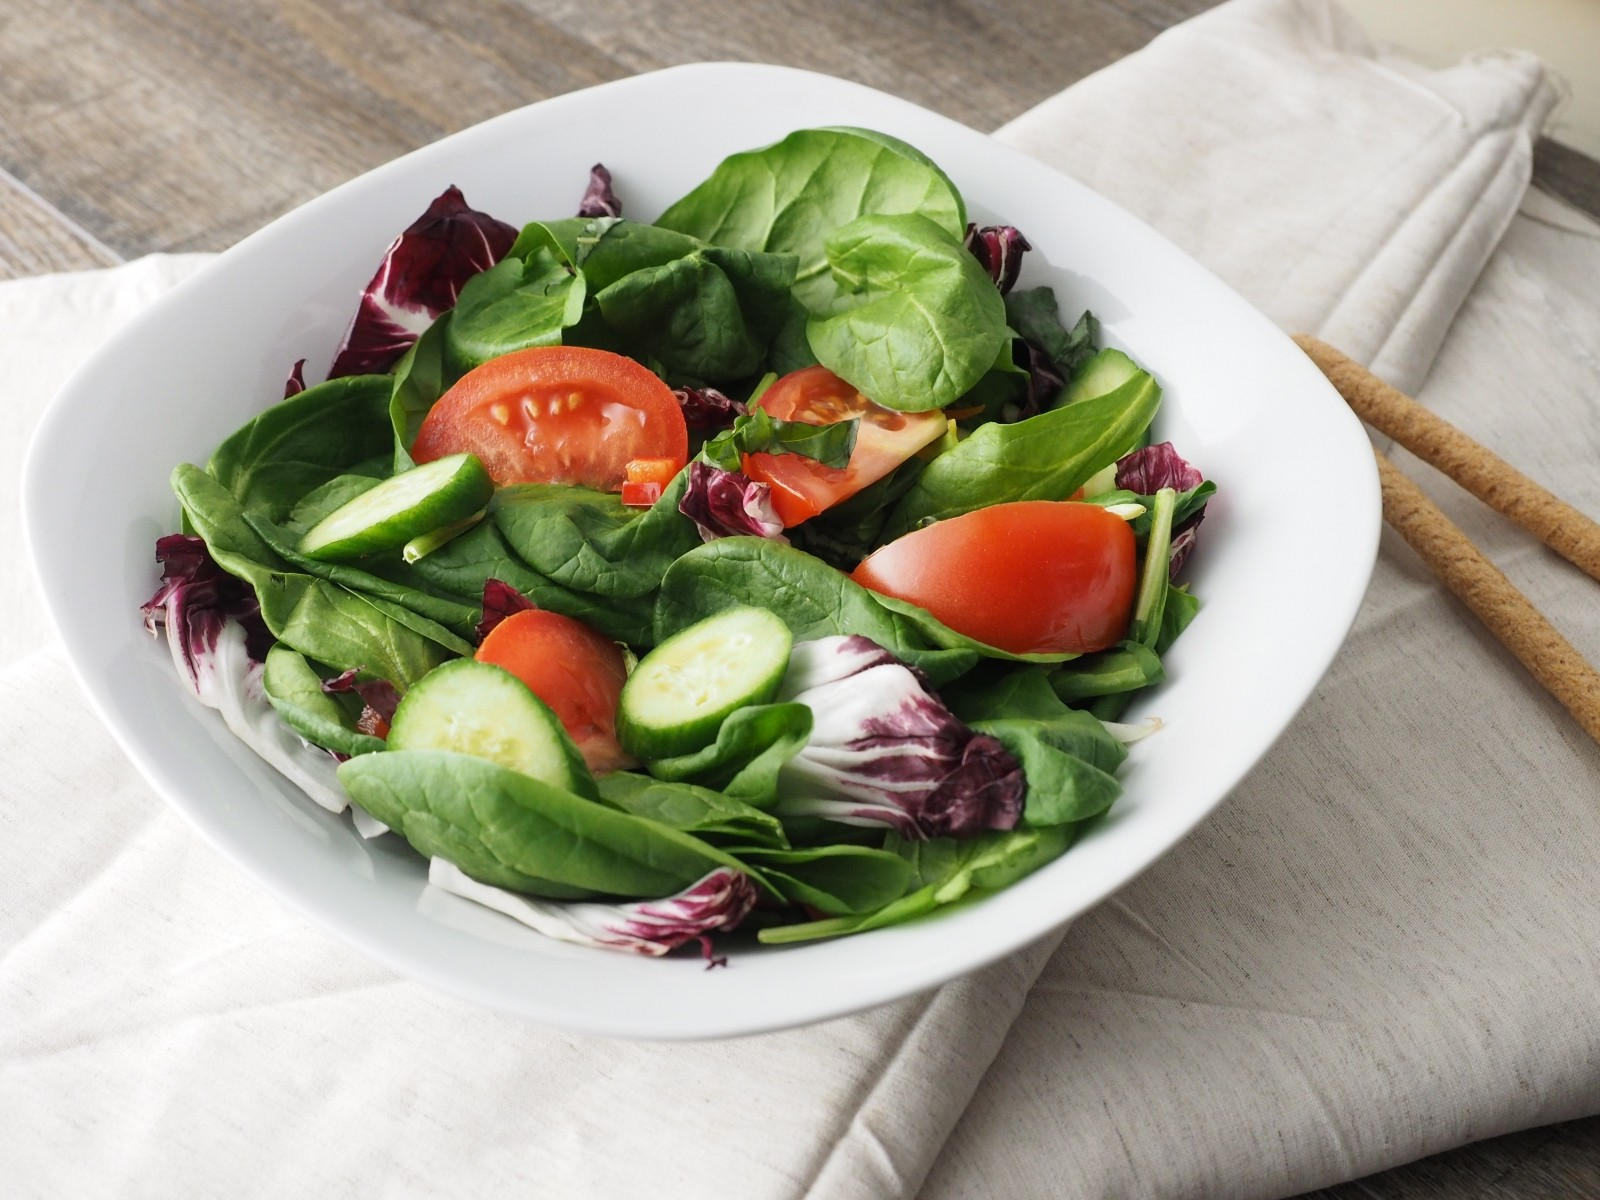 Helathy salad